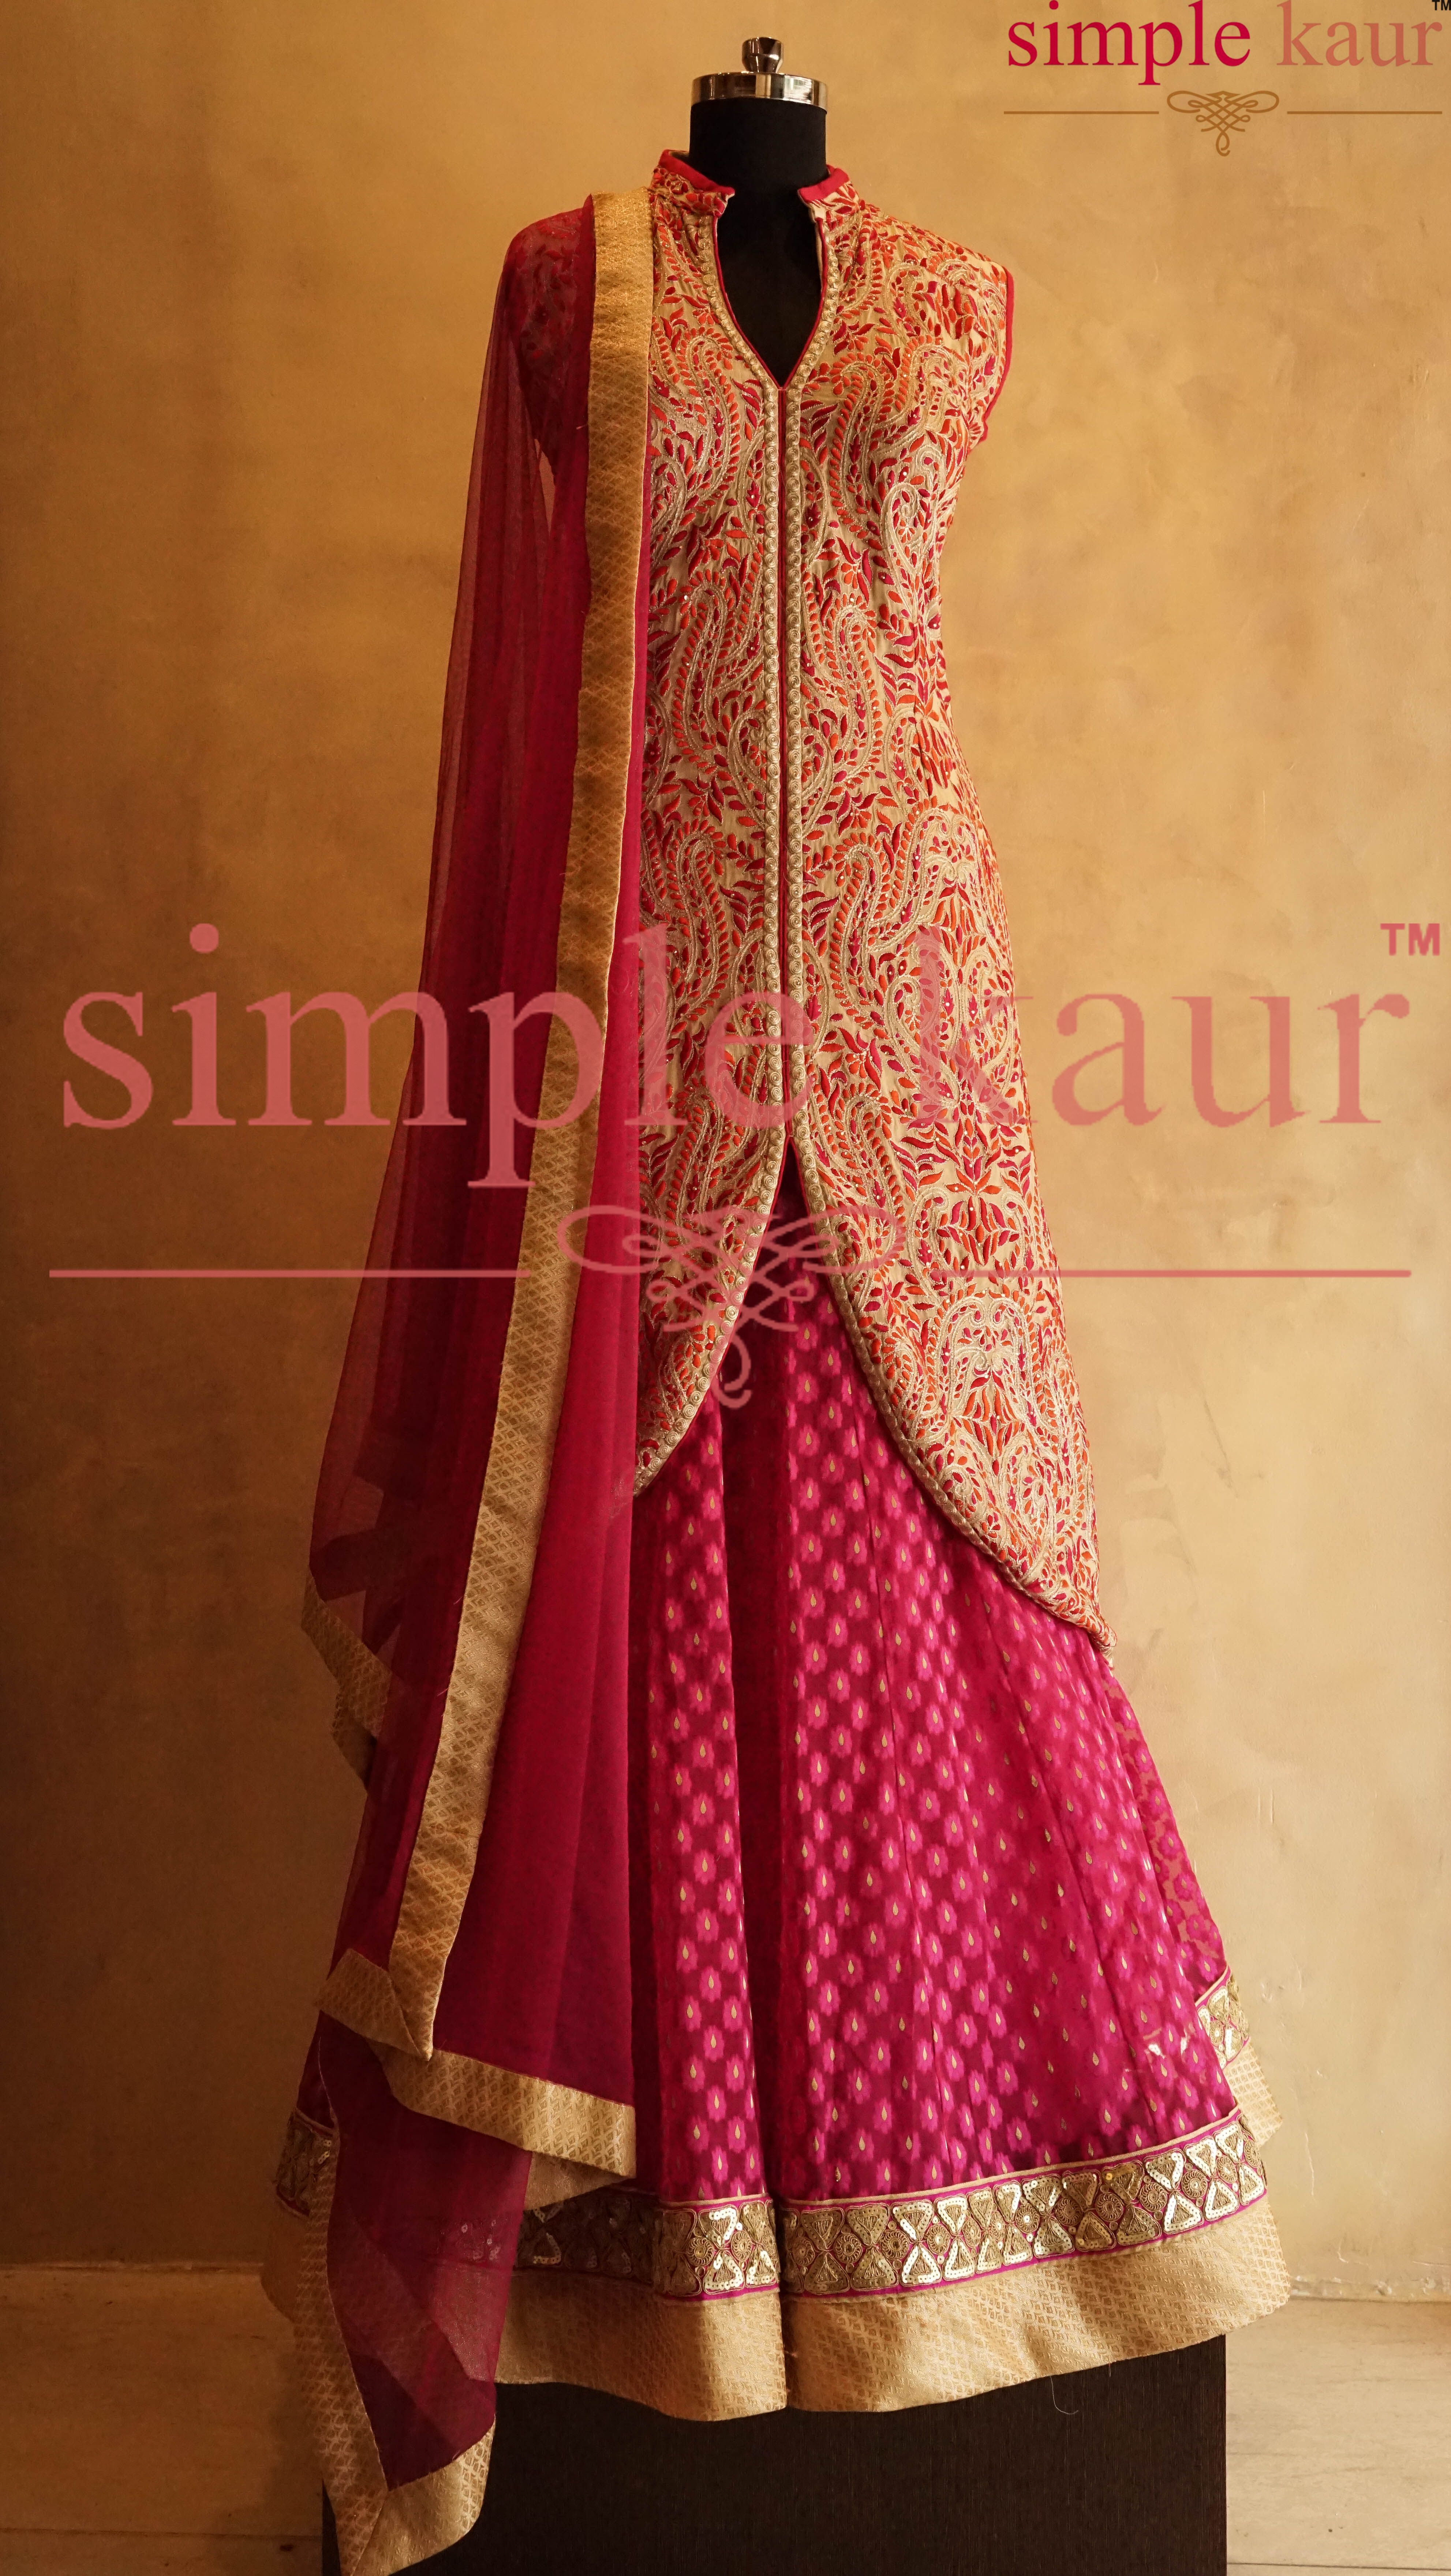 Watch Simple Kaur video